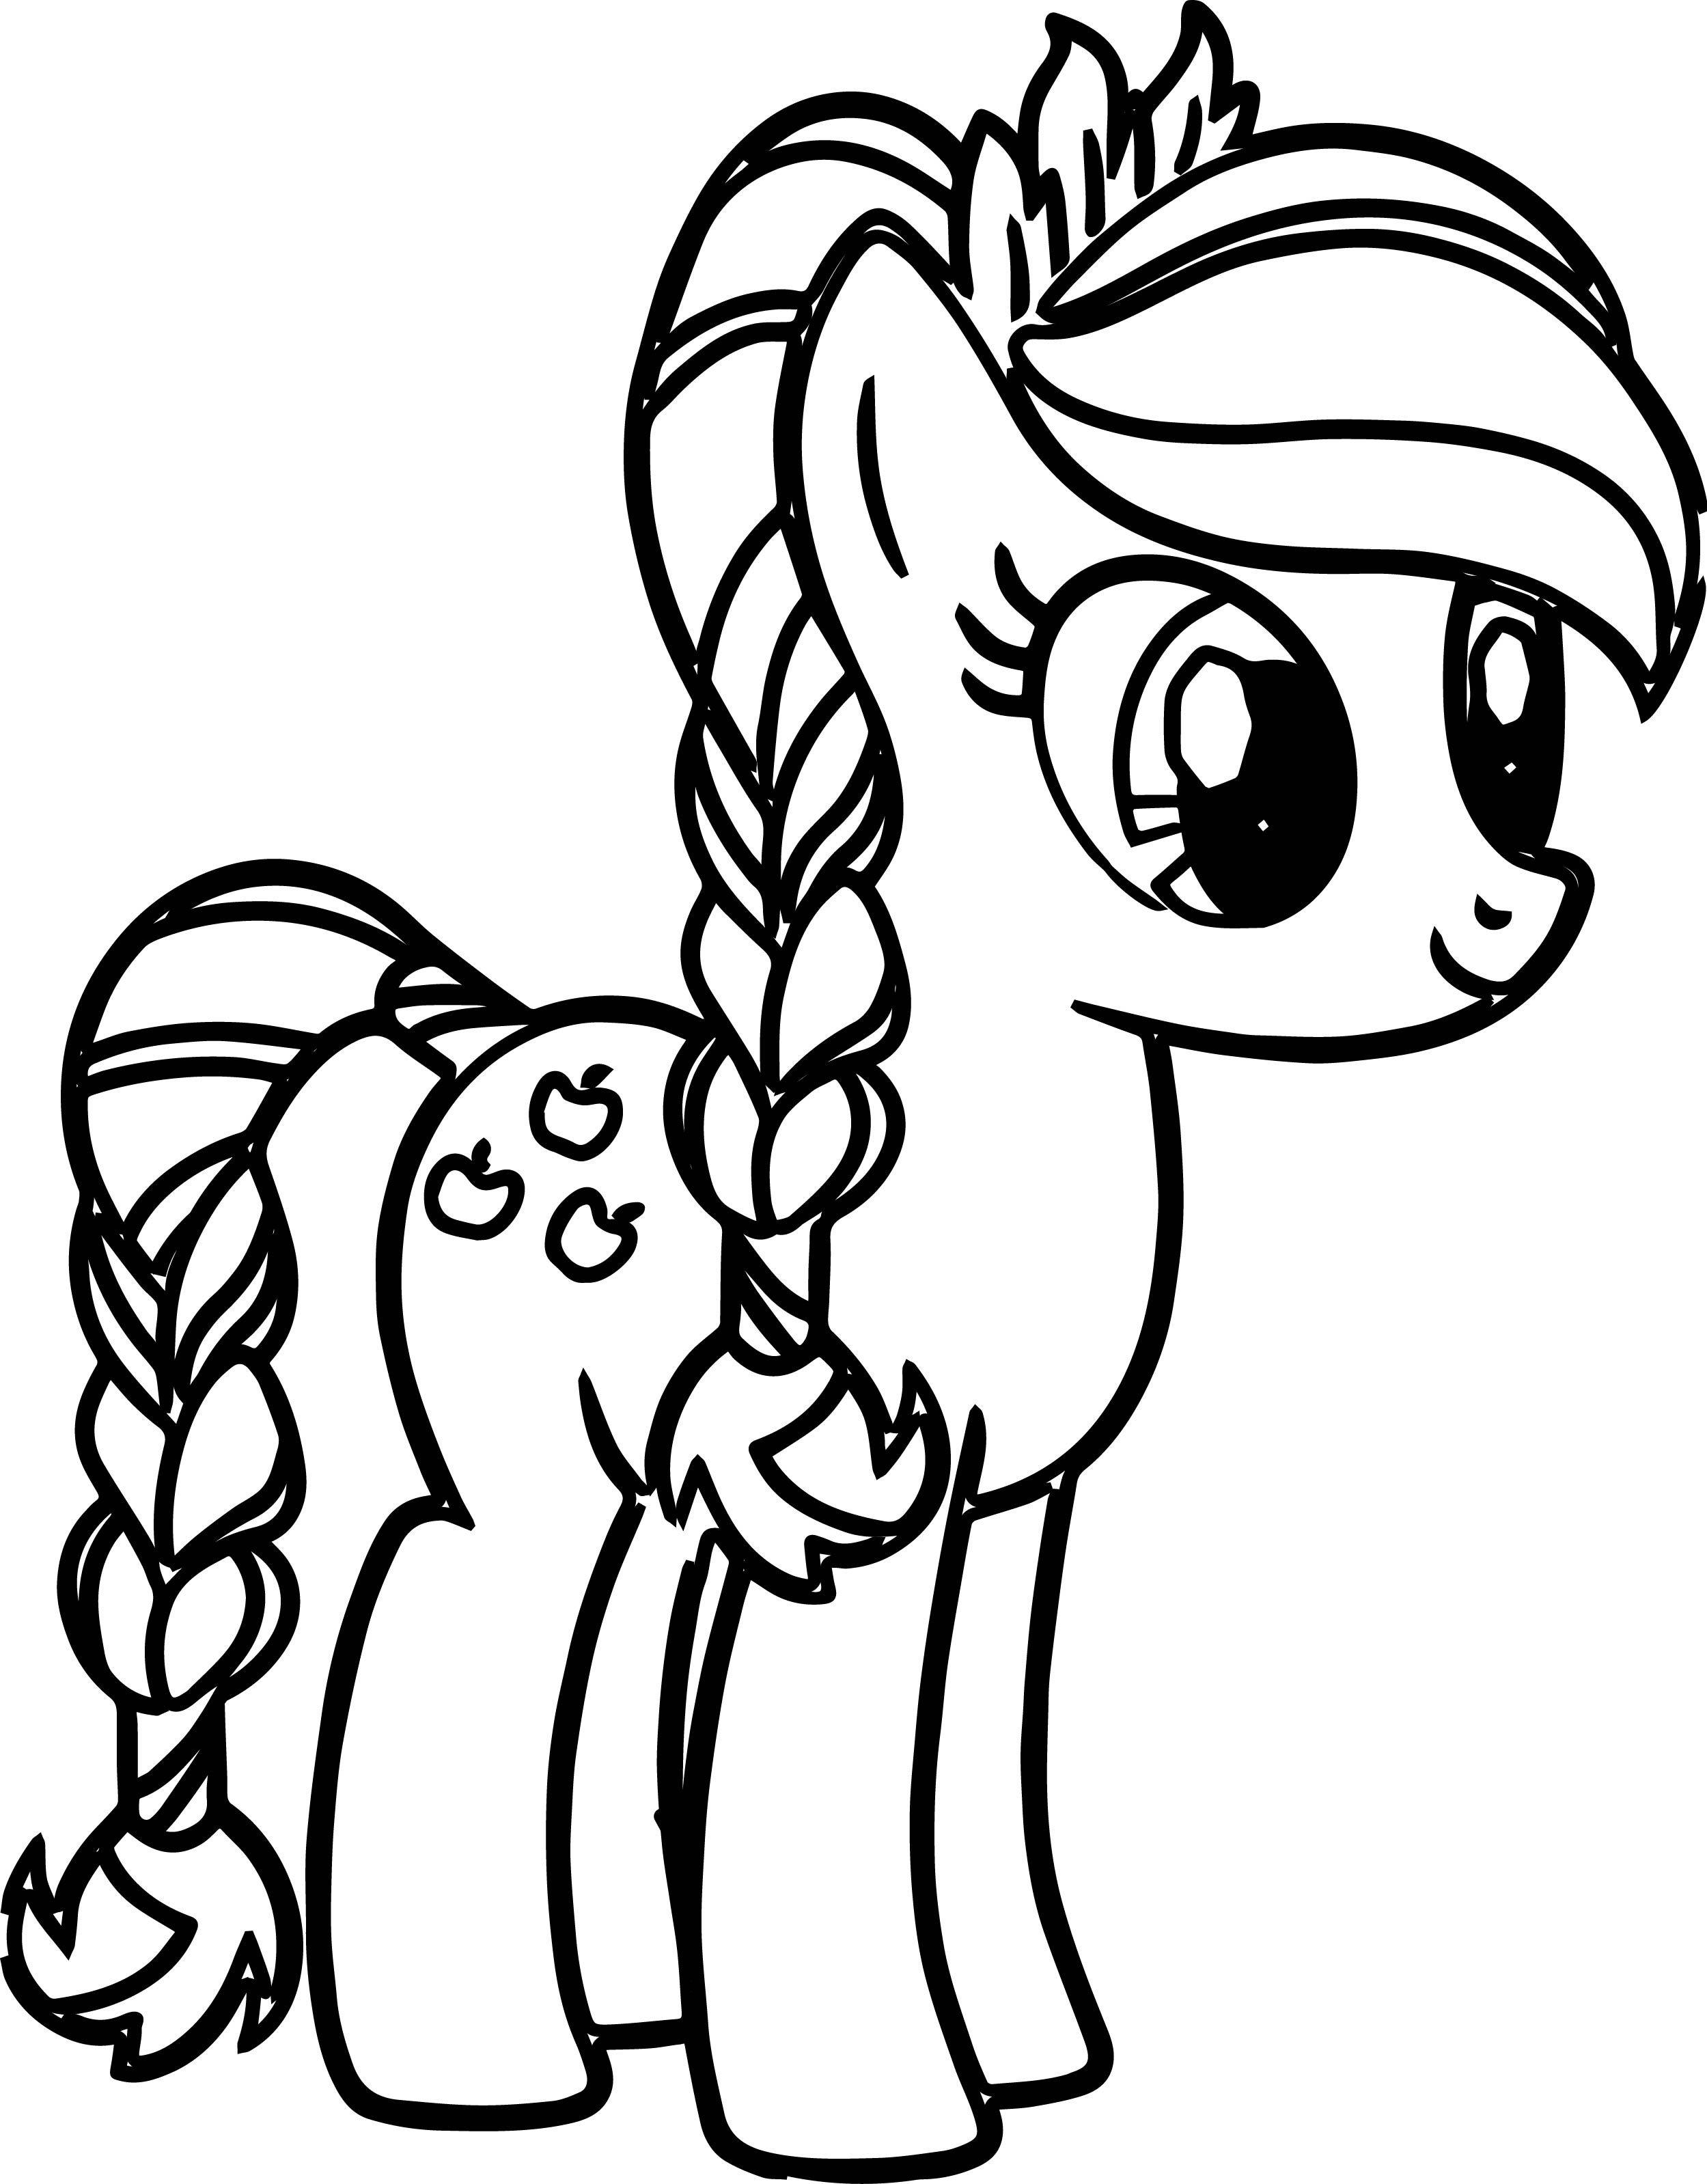 my little pony ausmalbilder # 1